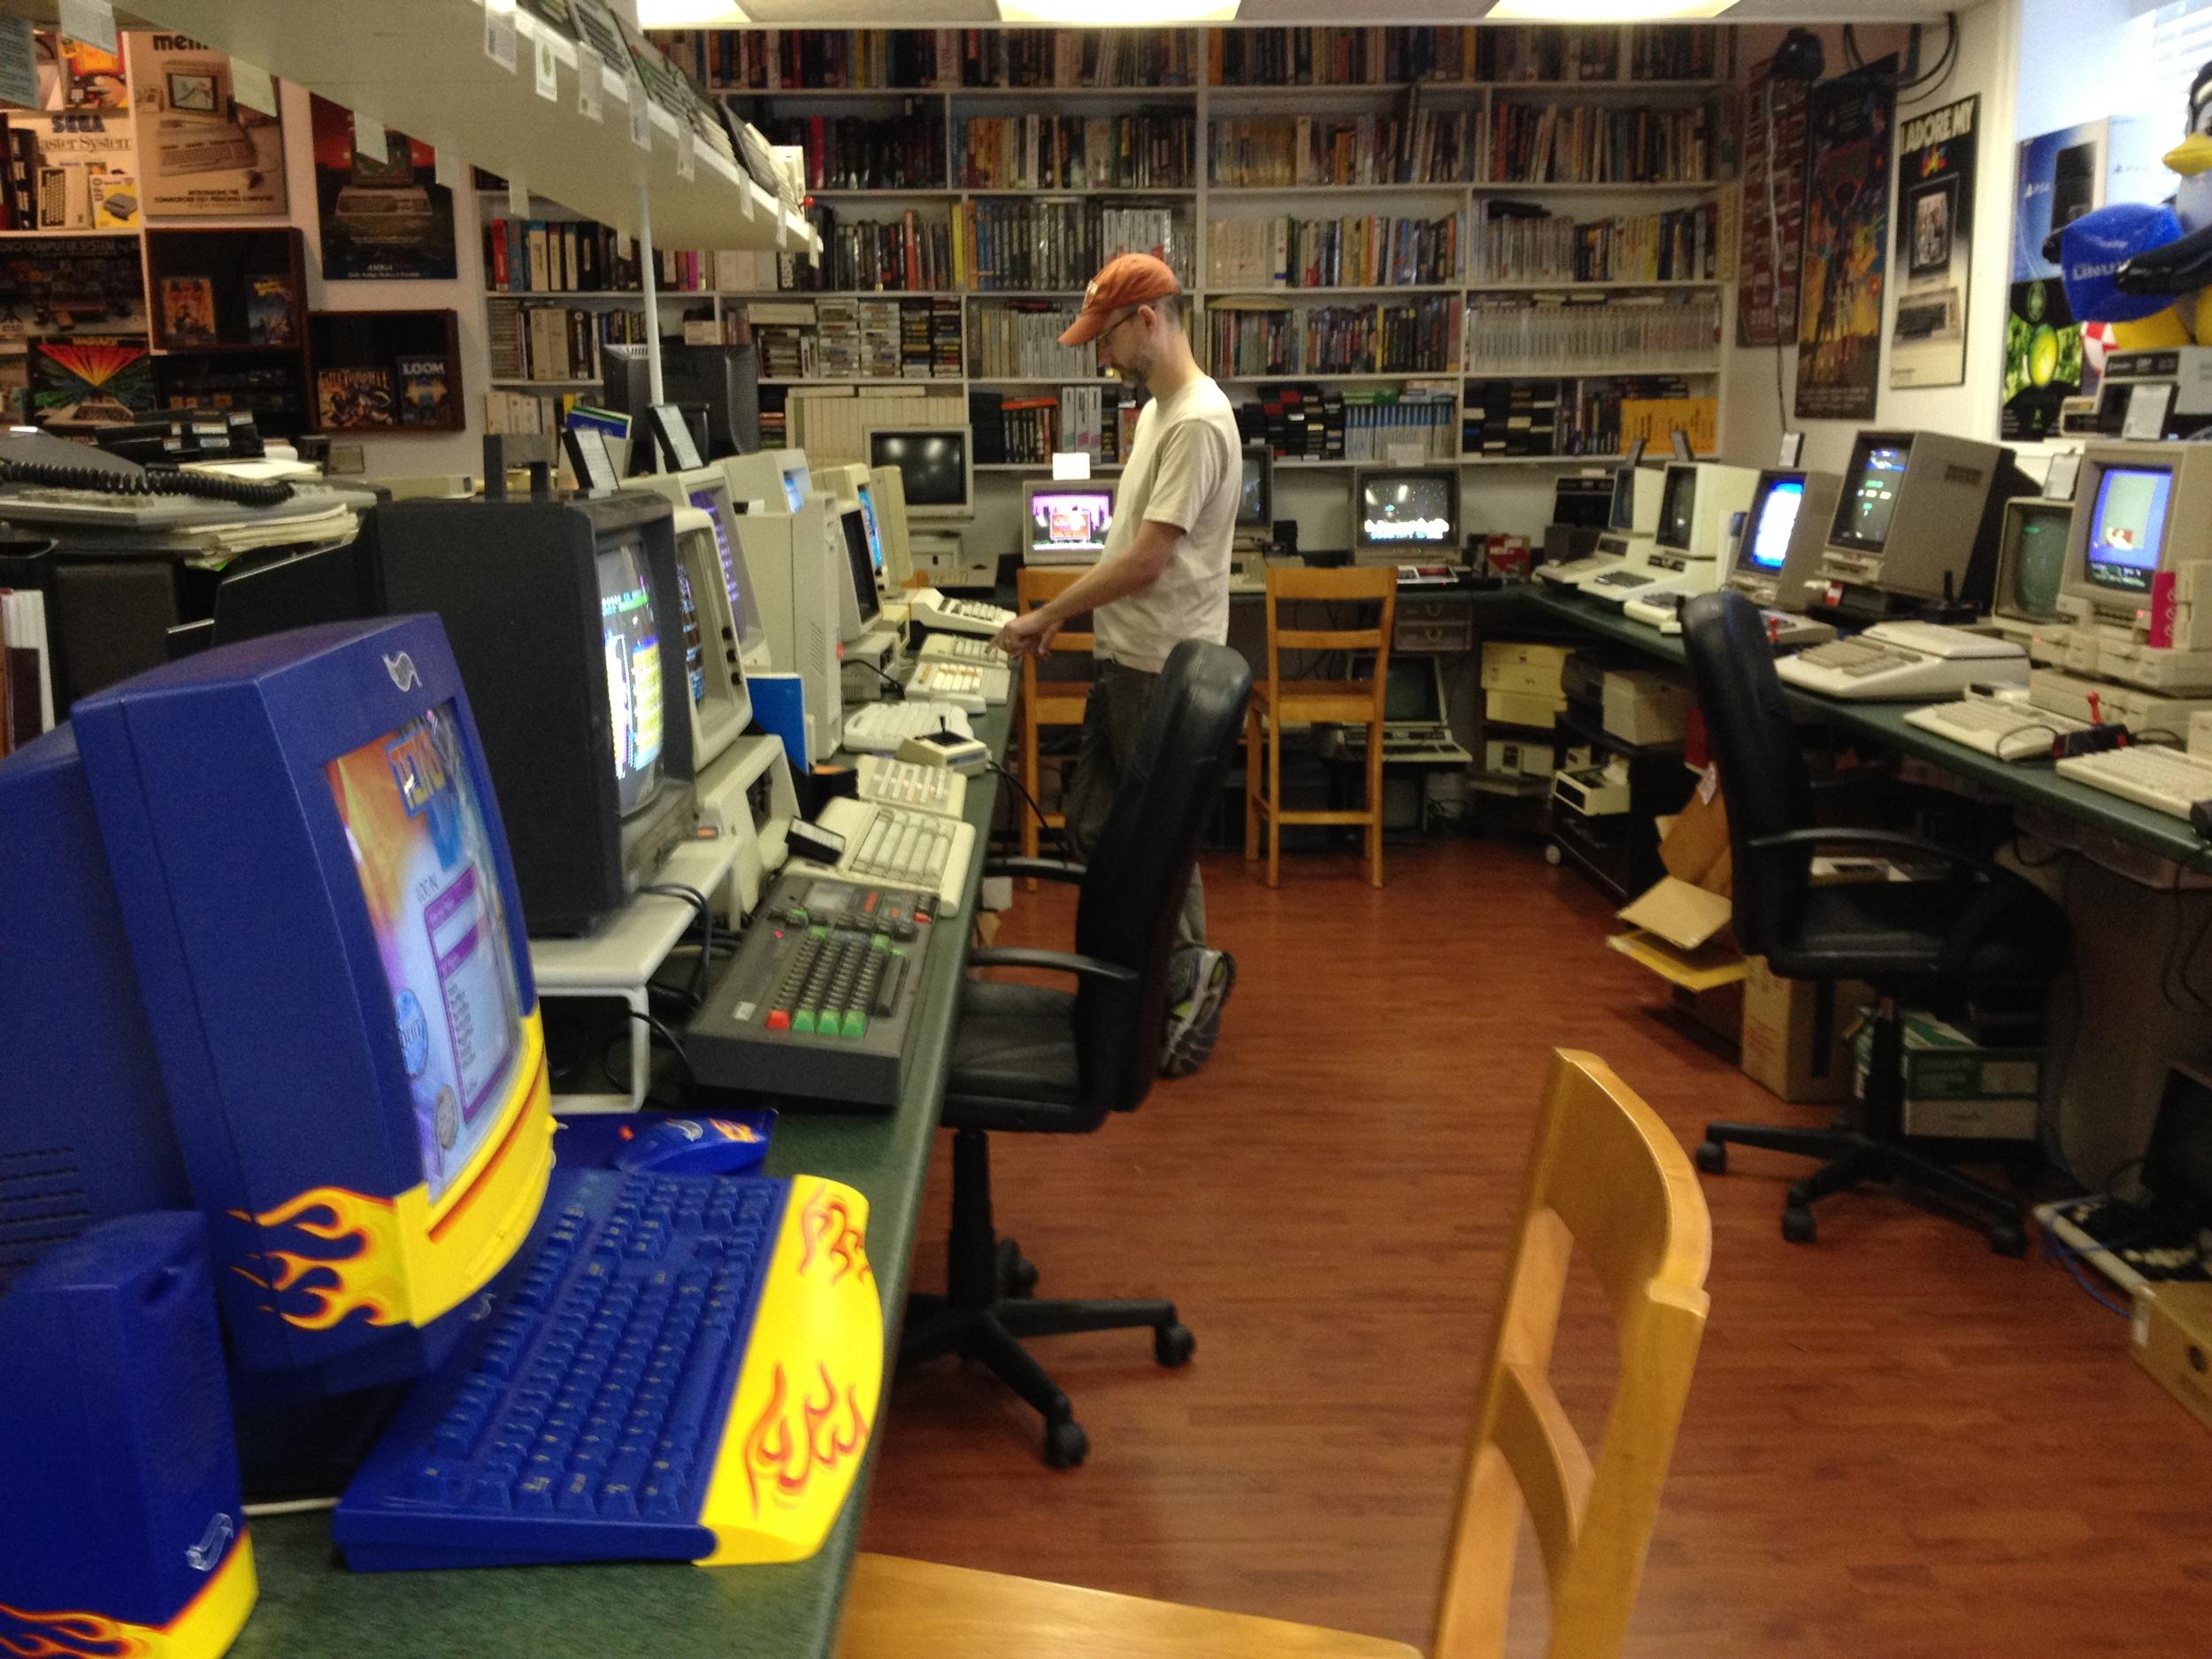 Matt enjoys a bit of nostalgia at The Personal Computer Museum in Brantford, Canada.